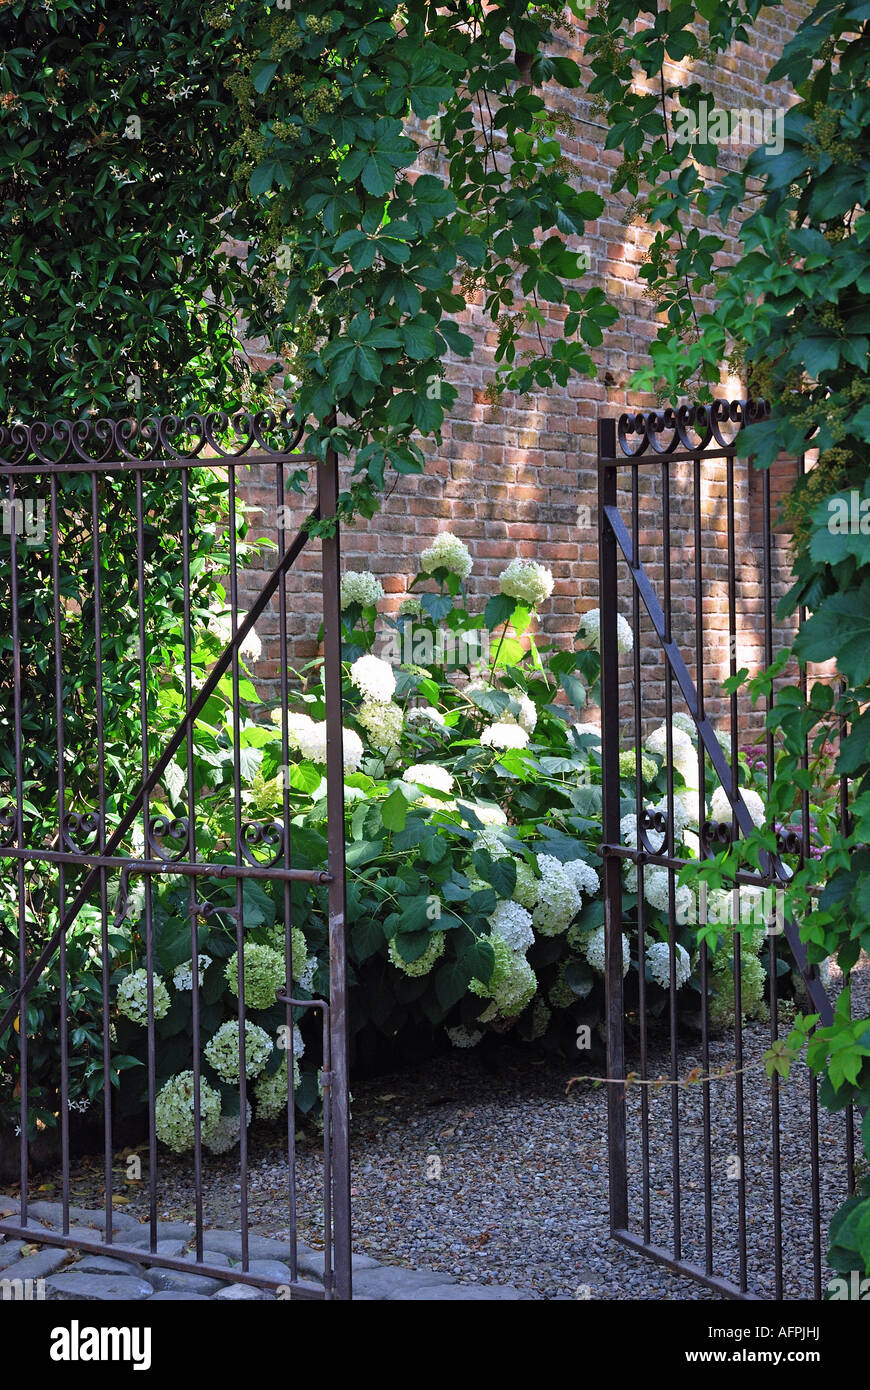 An Open Gate In A Country Farmhouse Garden In Italy Stock Photo Alamy